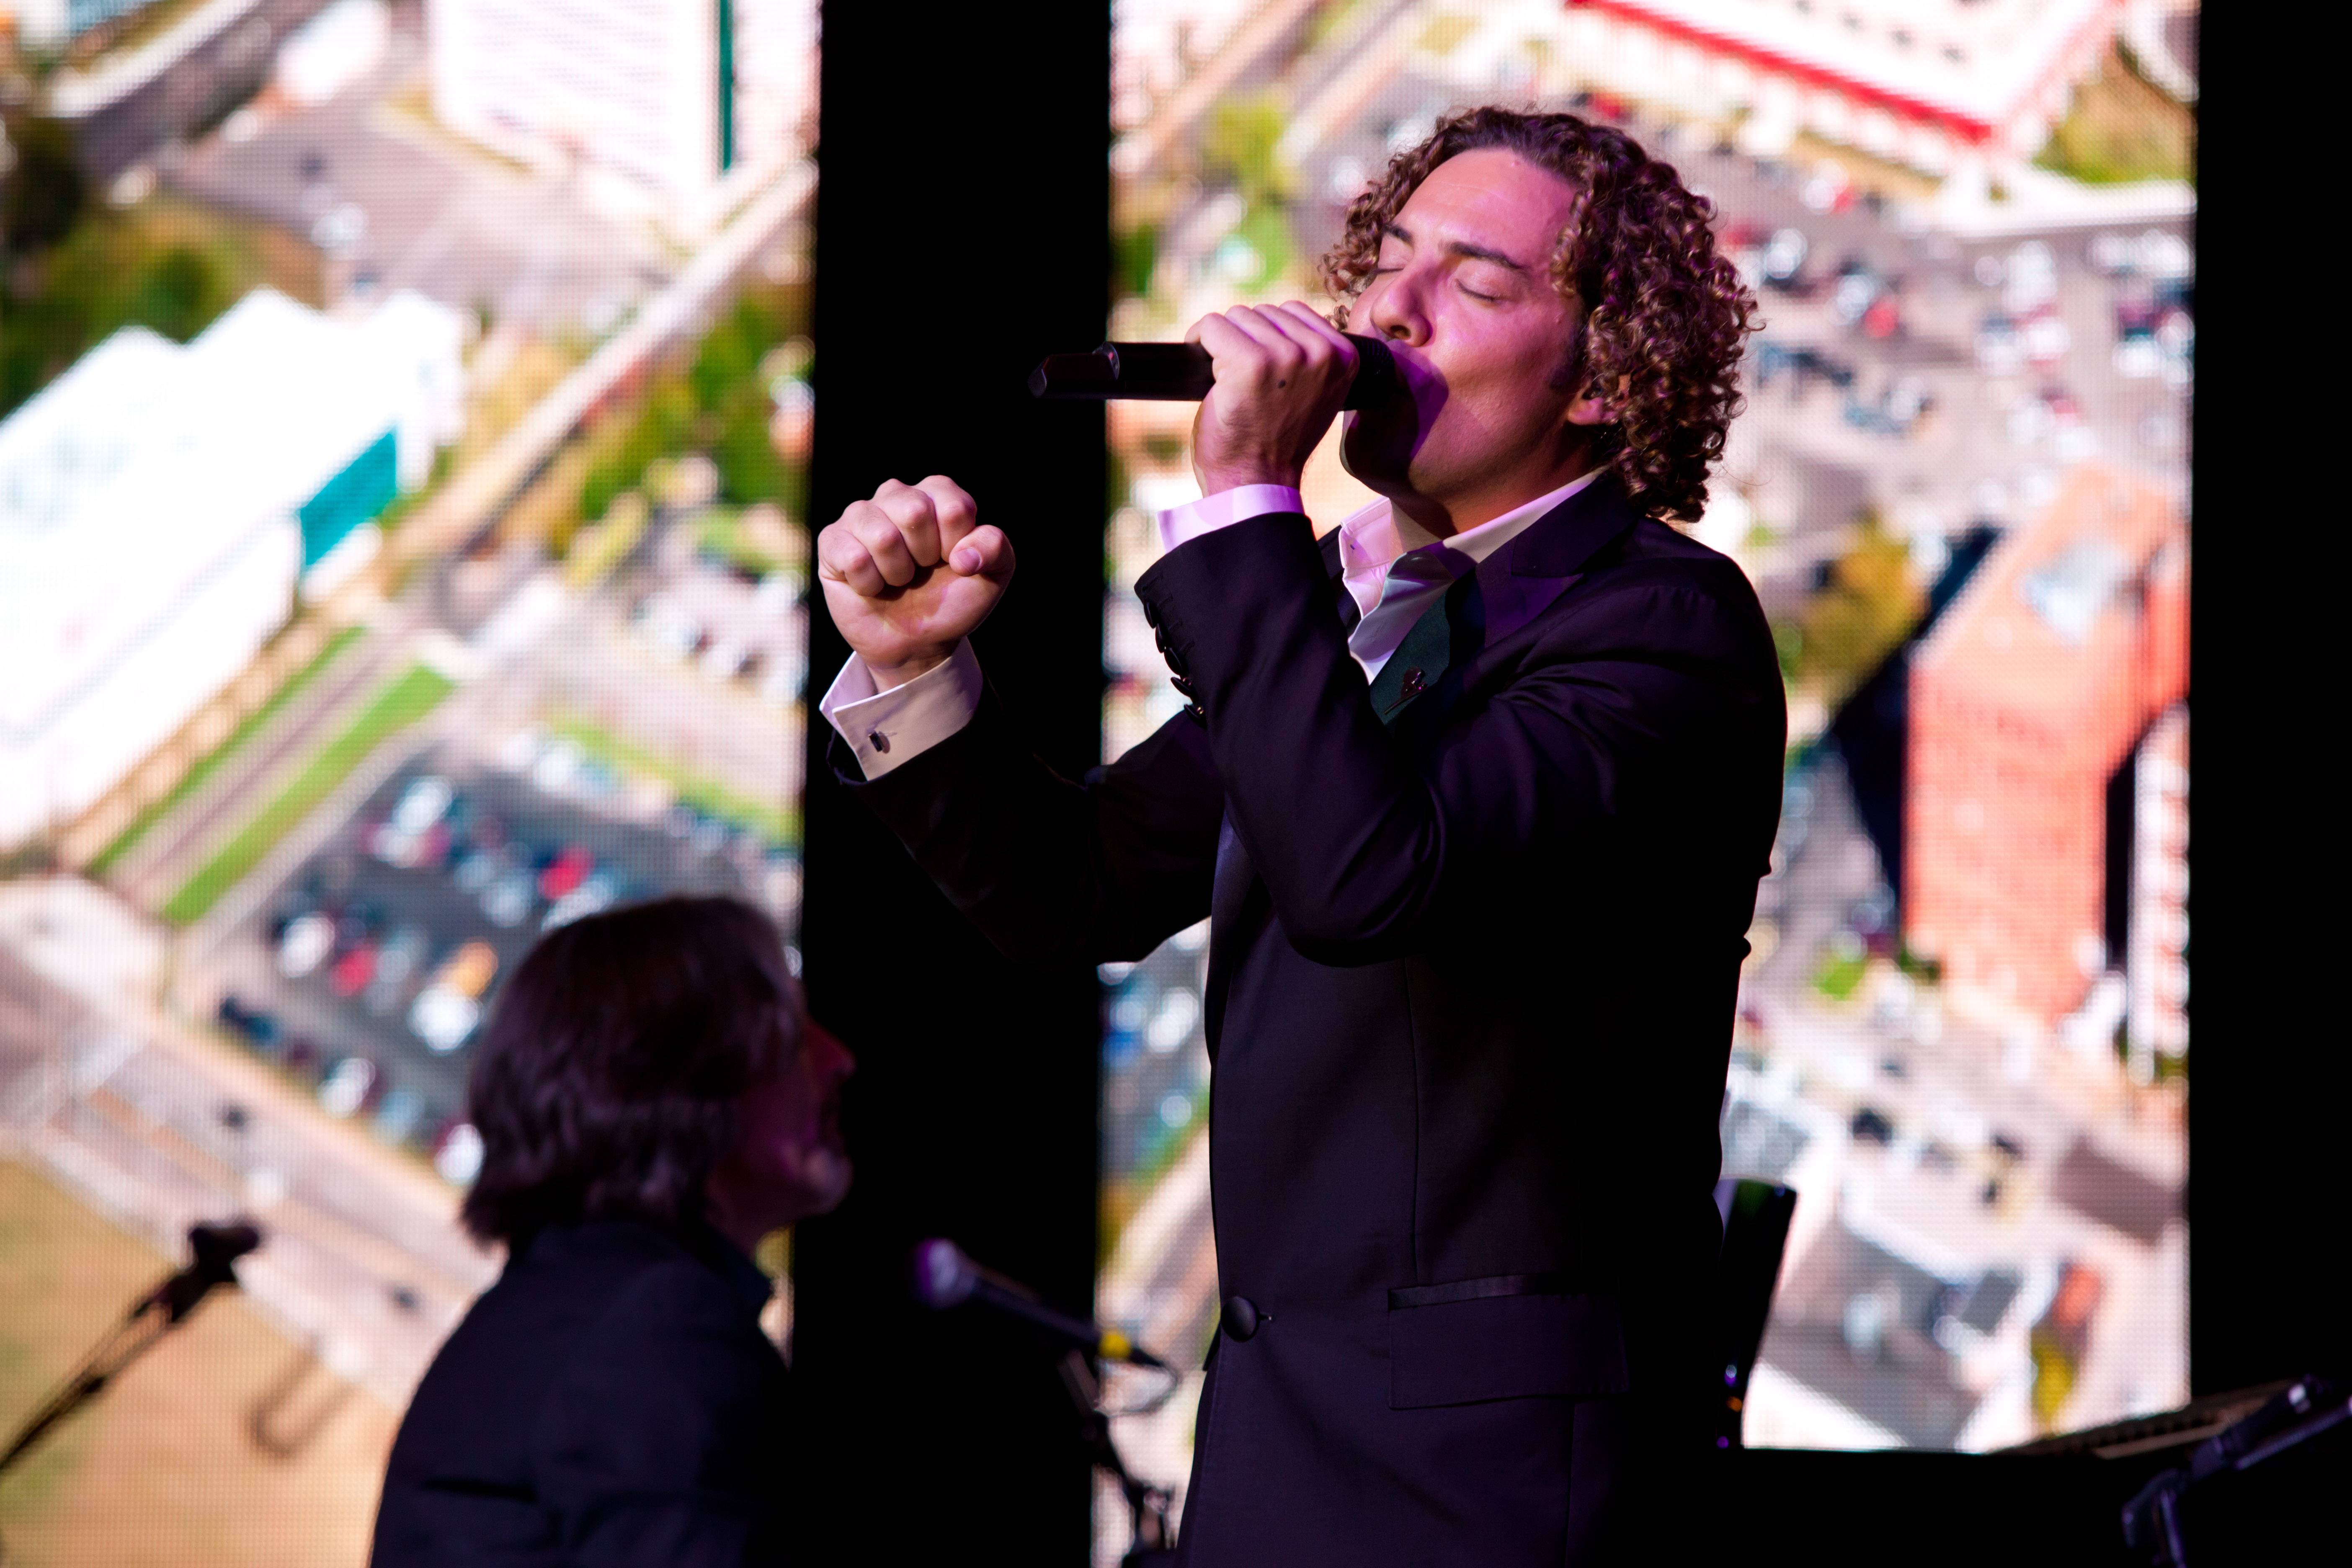 Latin super star David Bisbal performing at the event